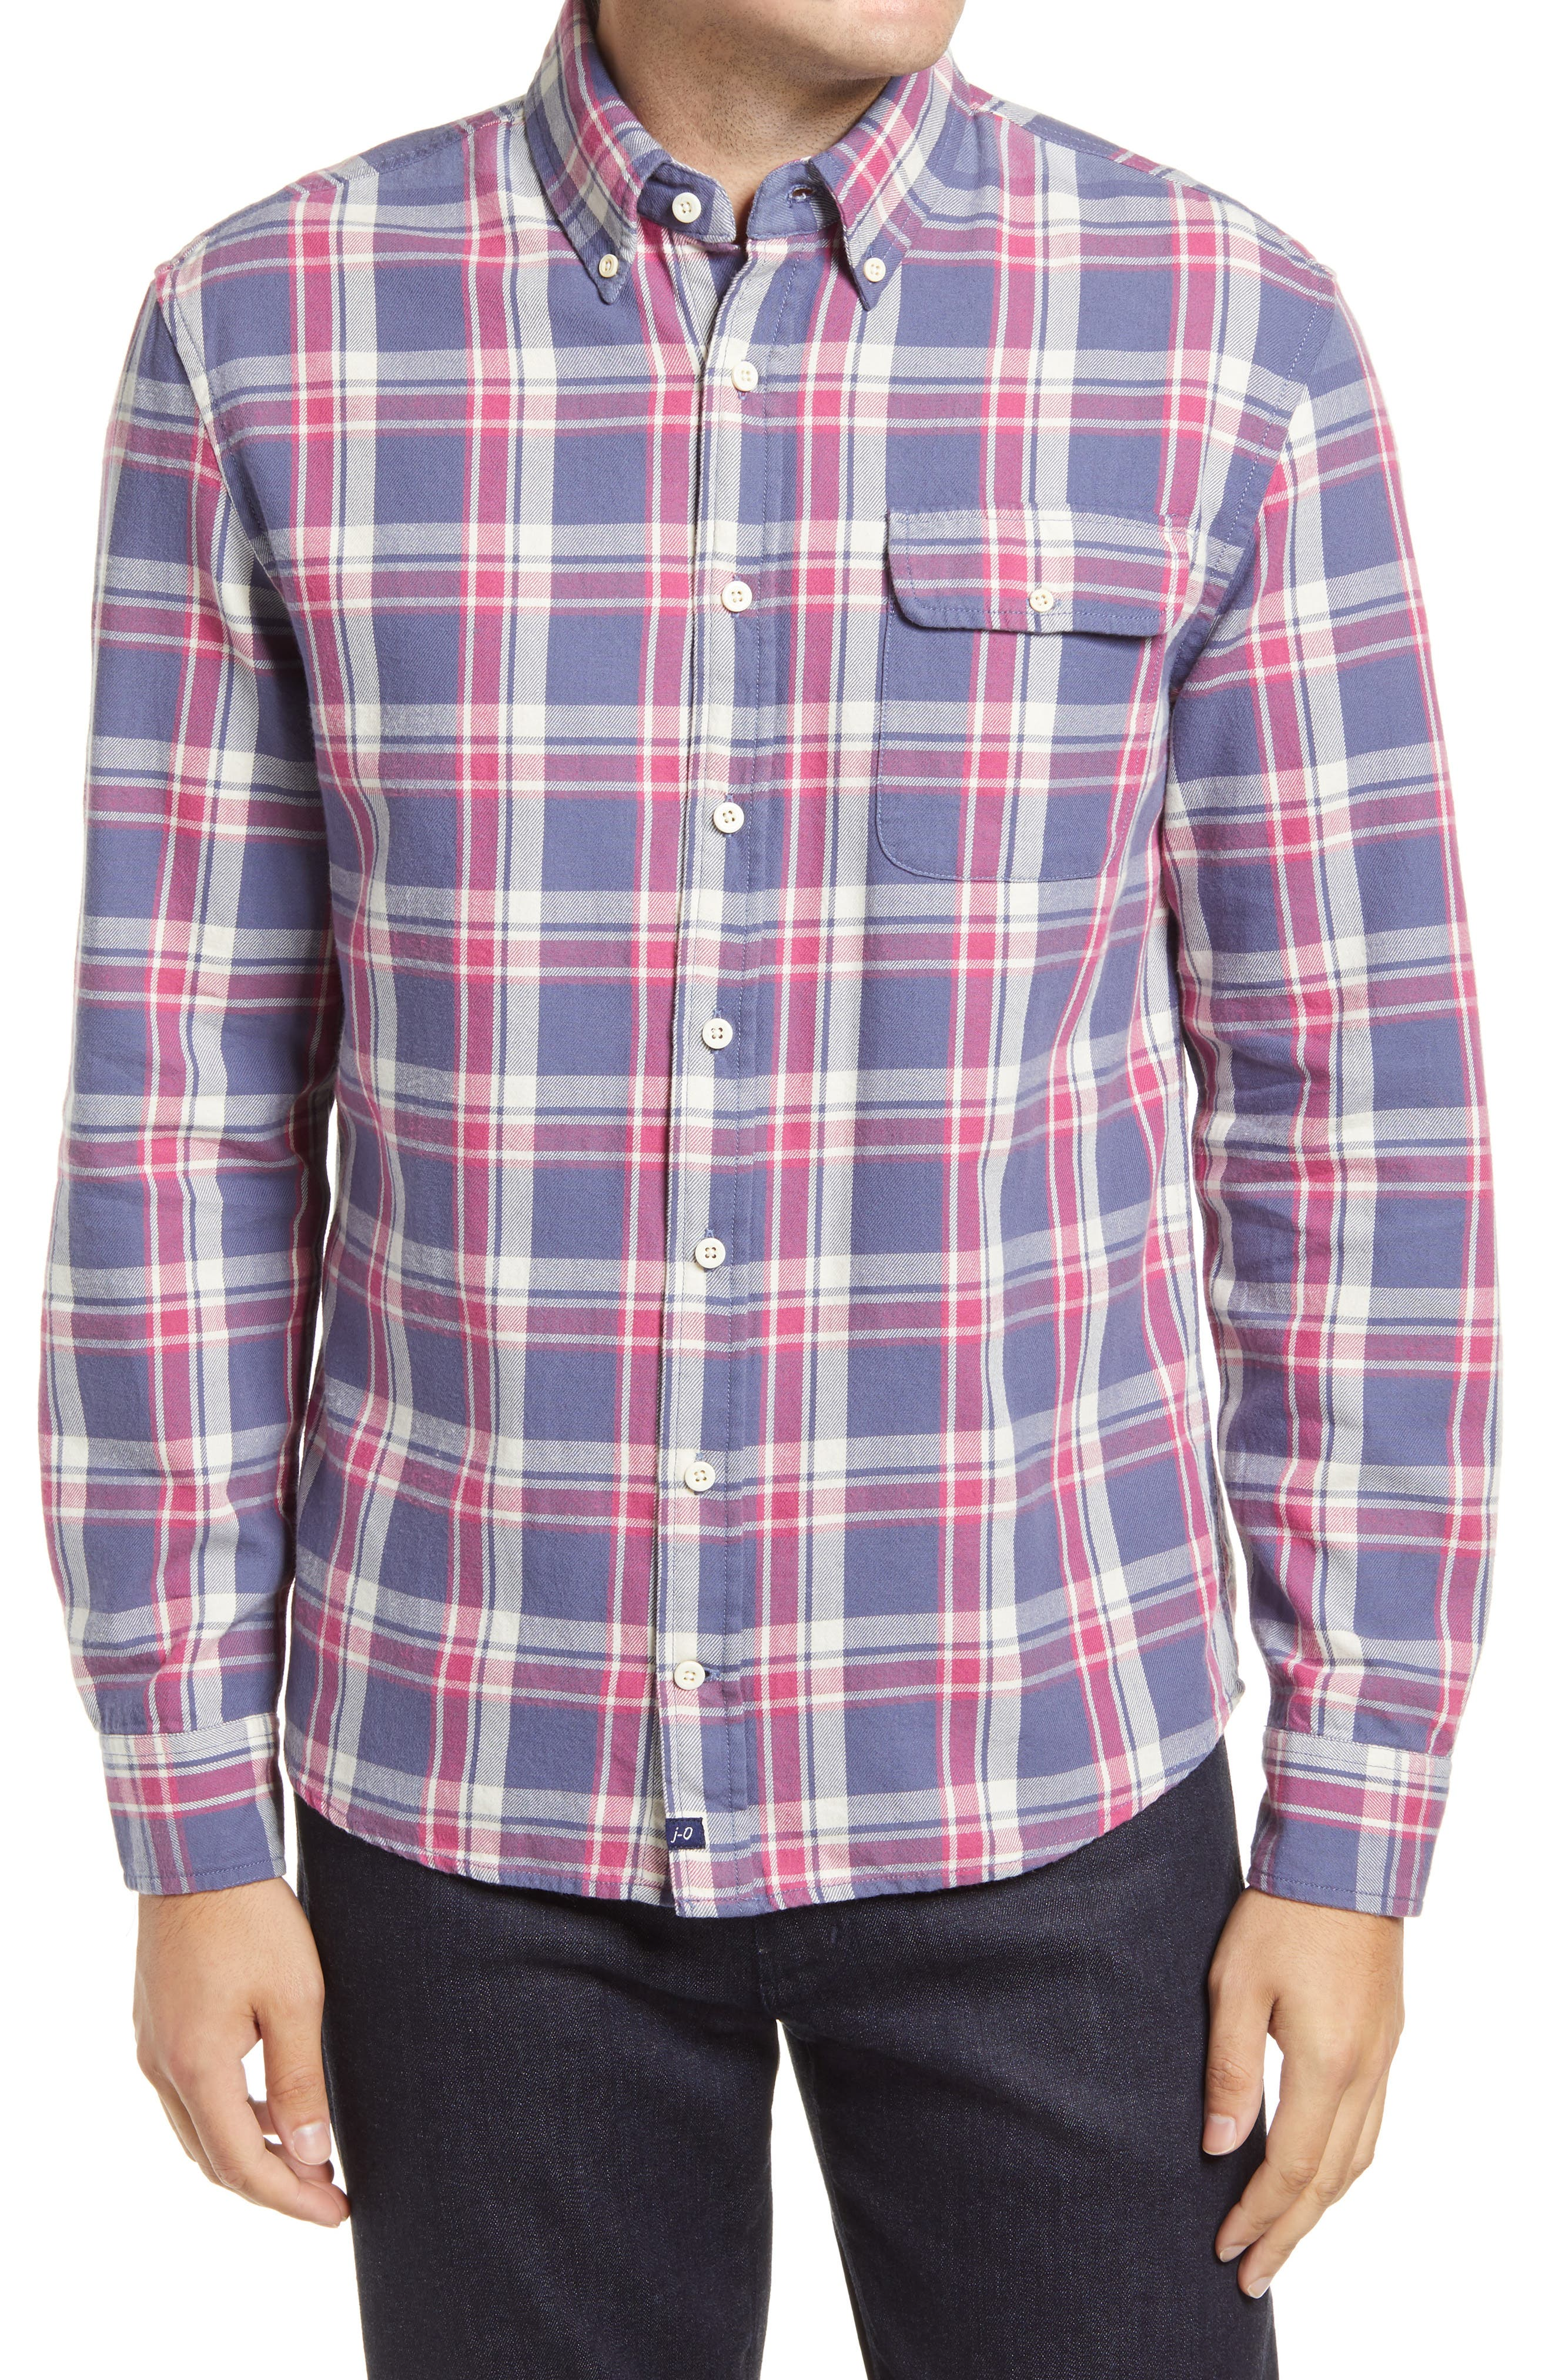 Hangin' Out Higgins Plaid Flannel Button-Down Shirt